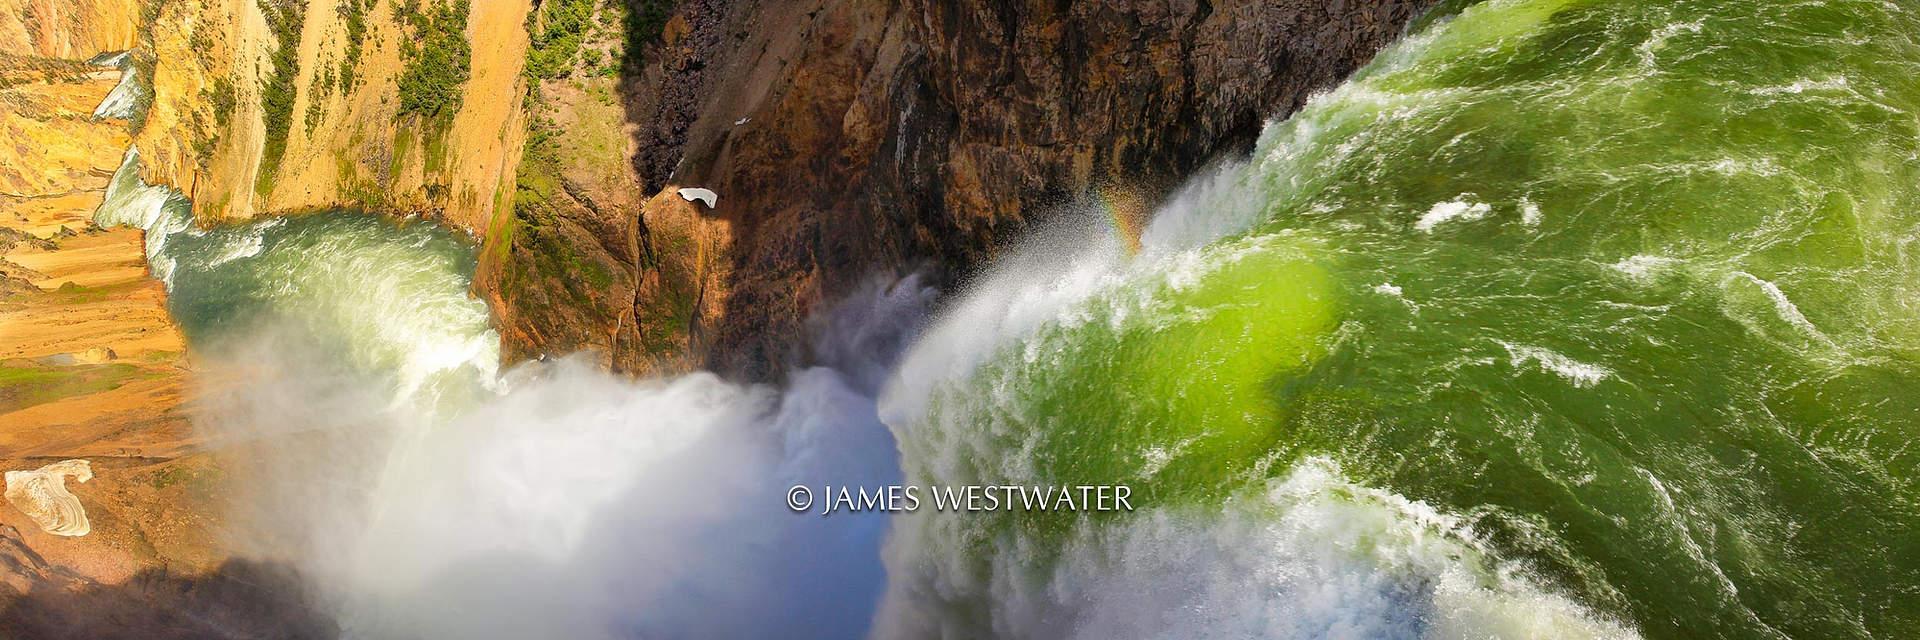 The Raw Power of Nature, Lower Yellowstone Falls, Yellowstone National Park, Wyoming